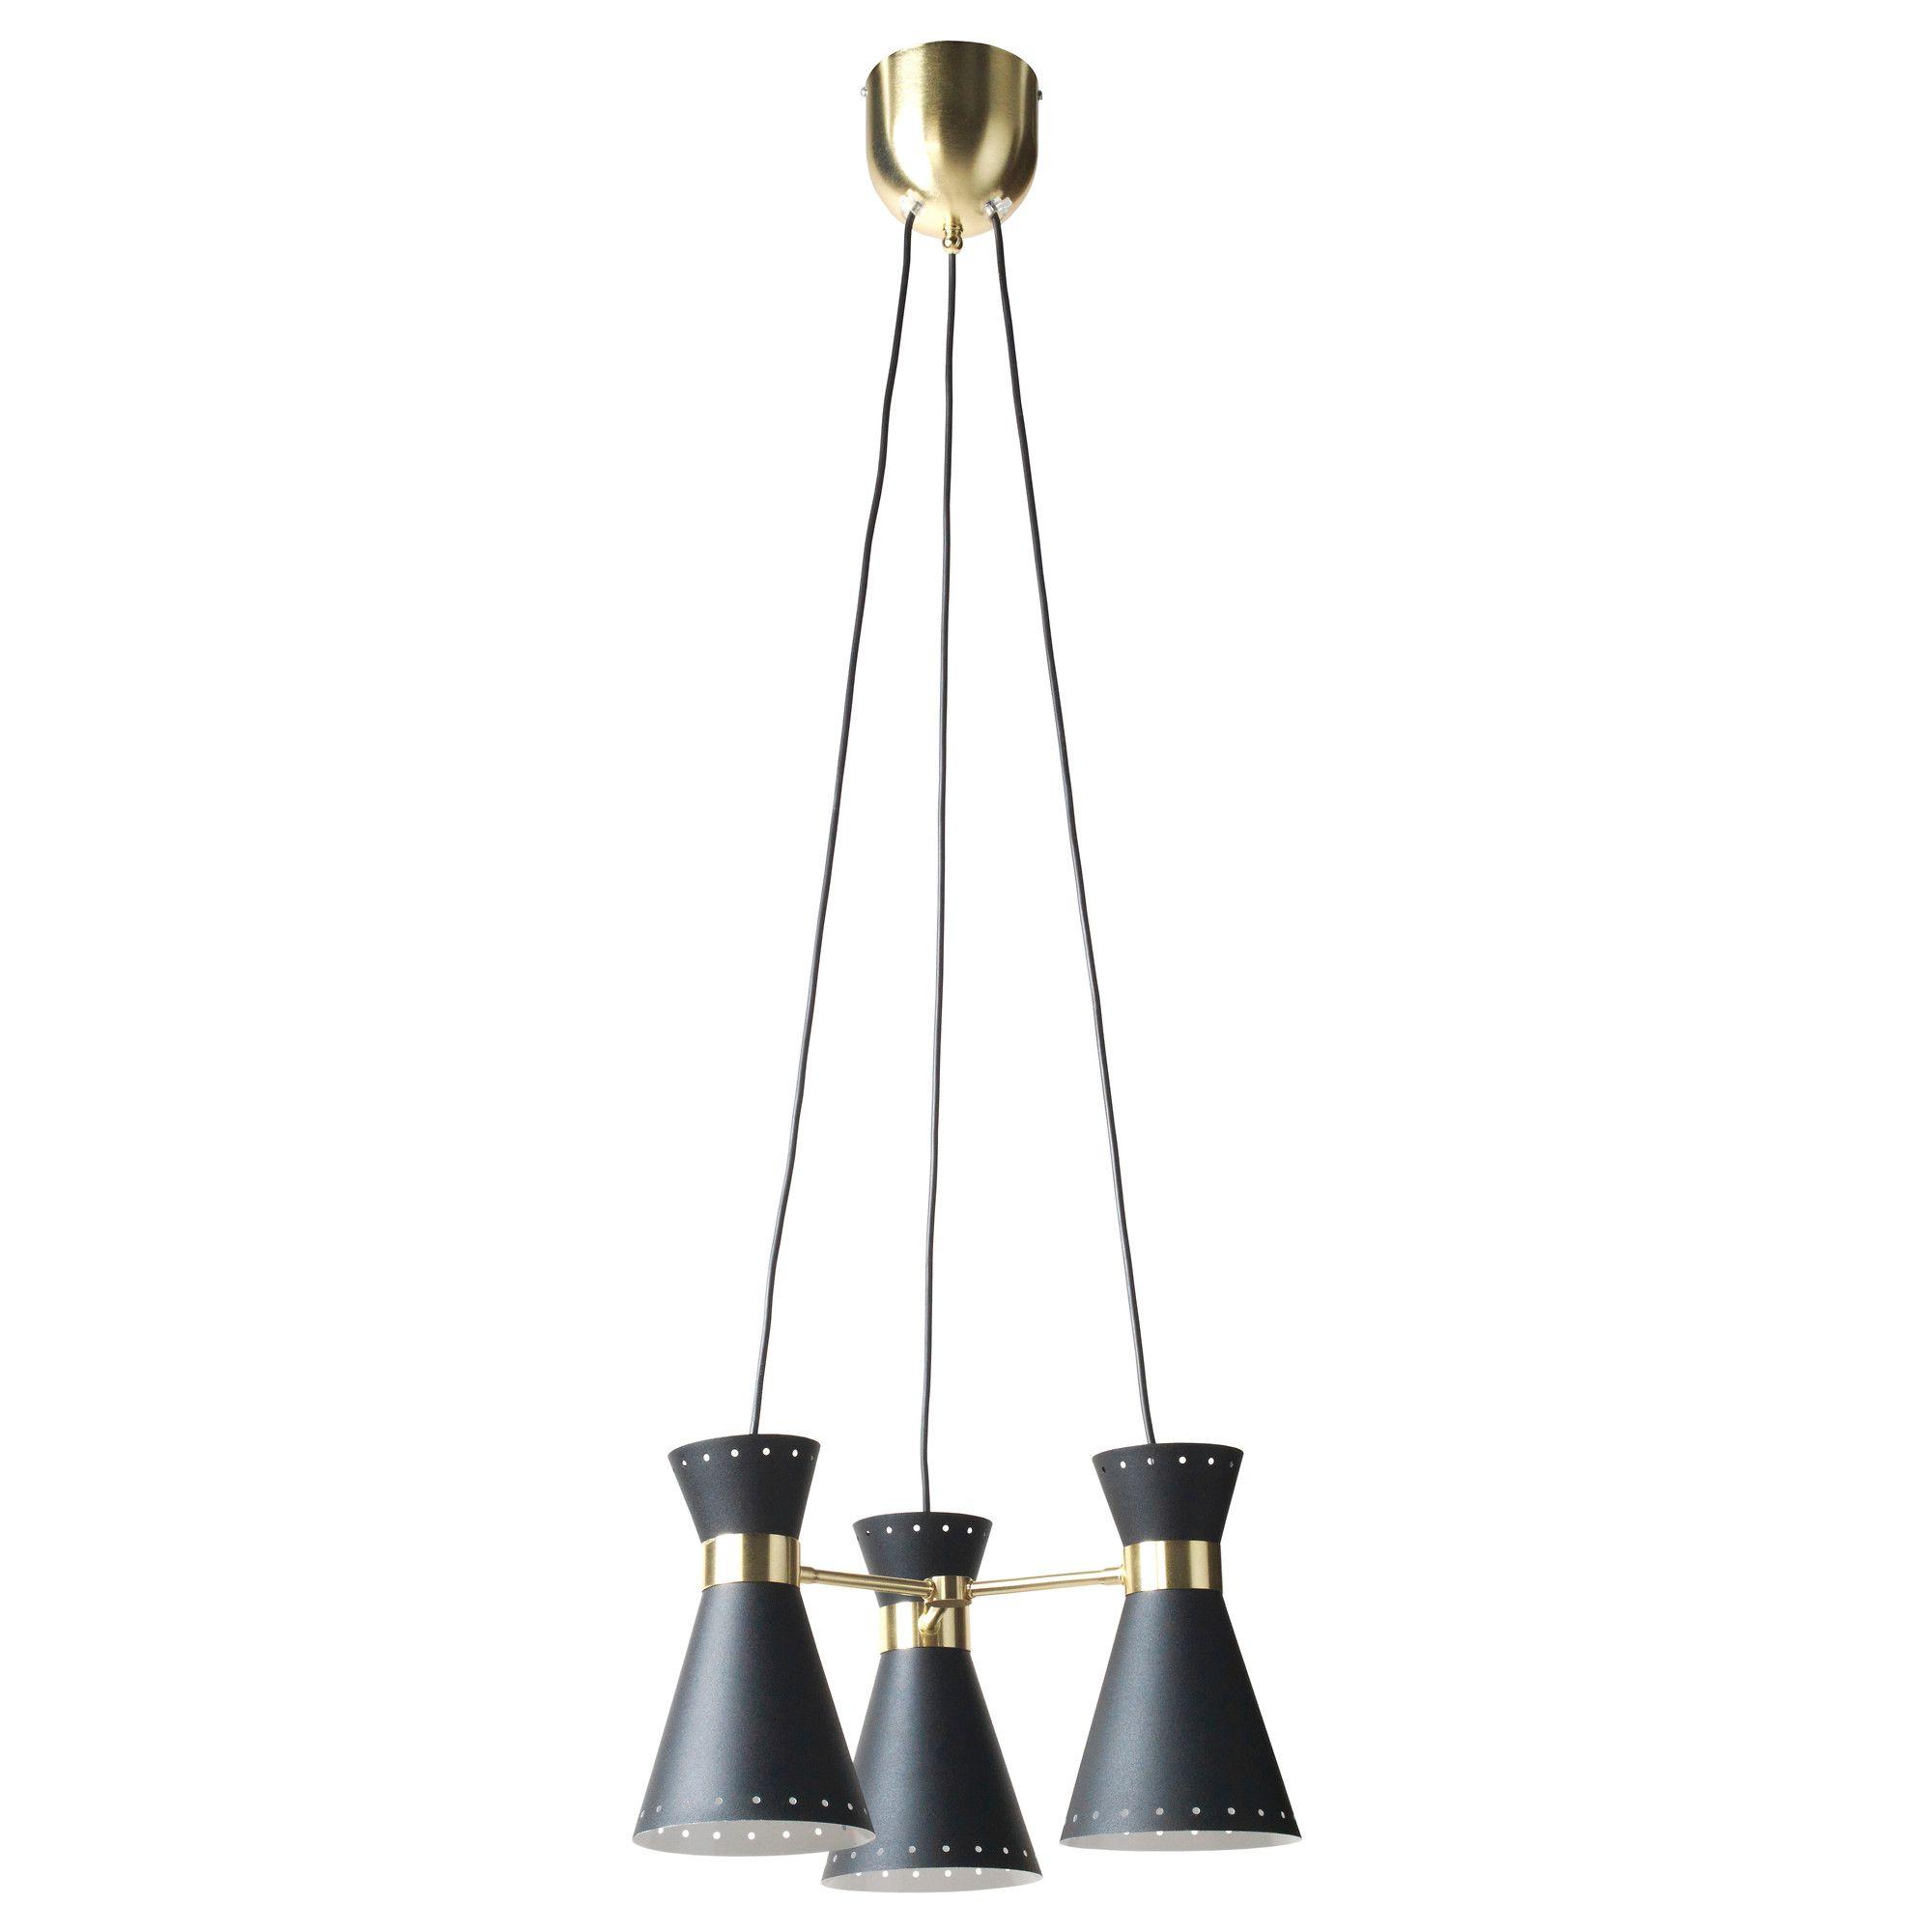 ARJEPLOG Suspension 3 lampes noir laiton étoiles IKEA